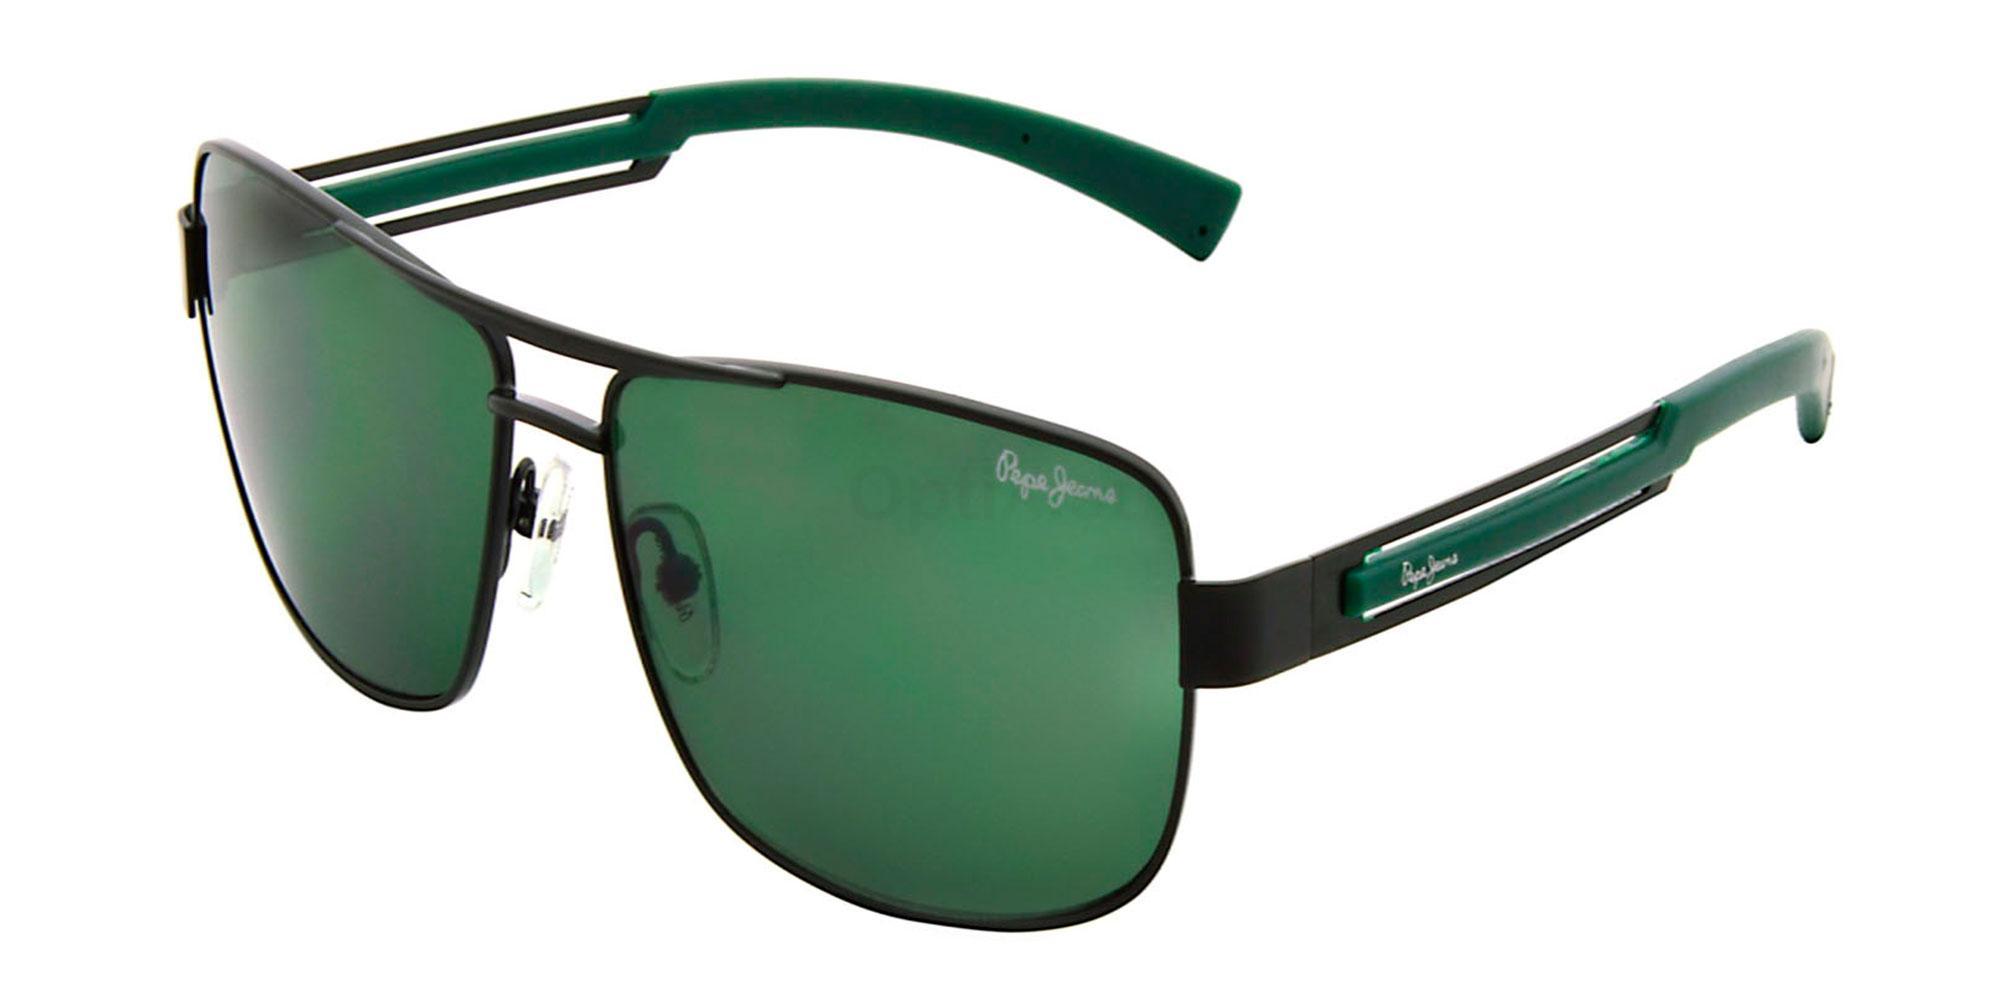 C1 PJ5090 Sunglasses, Pepe Jeans London